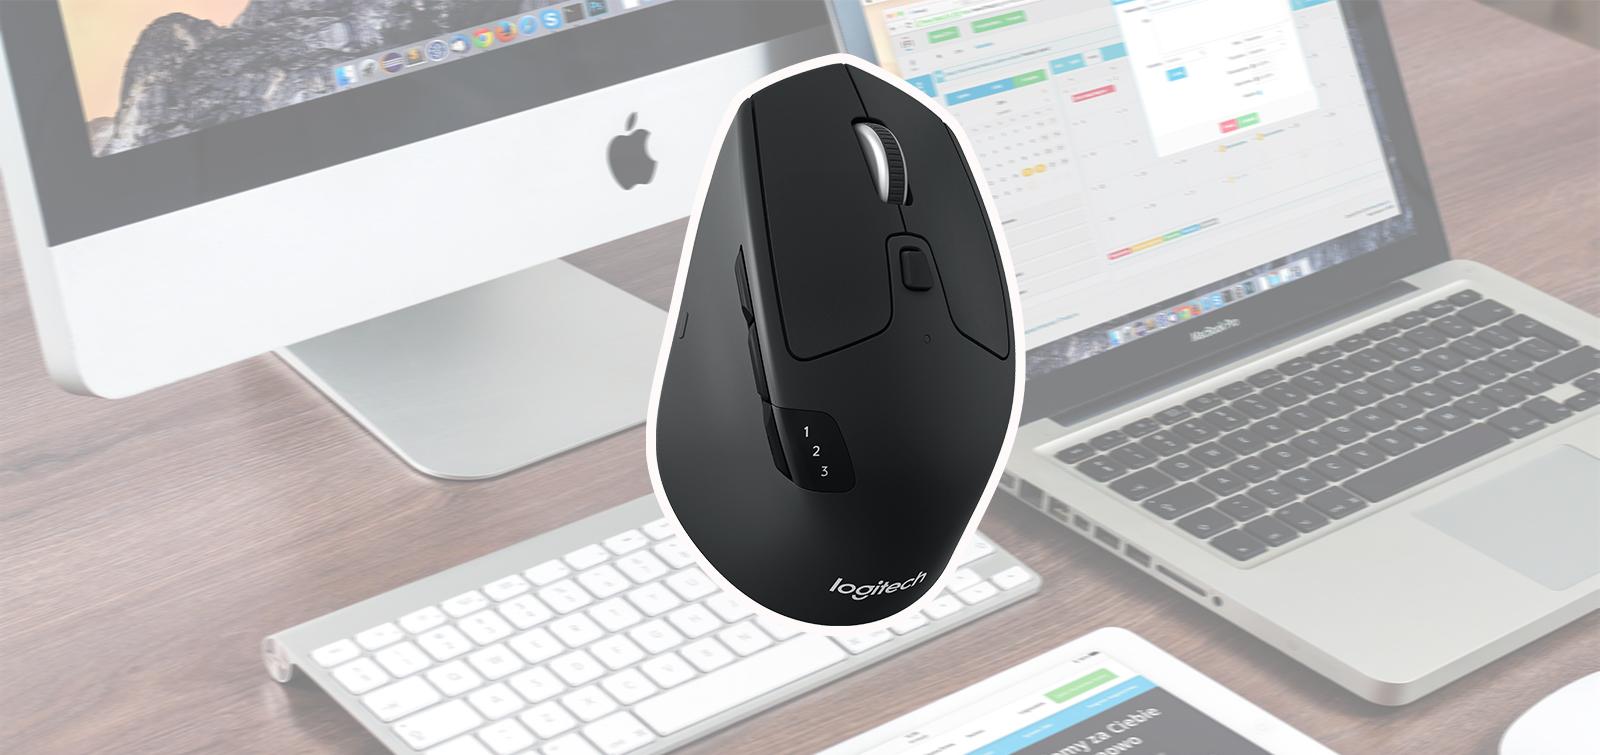 Logitech M720 Triathlon Multi-device Wireless Mouse - Black